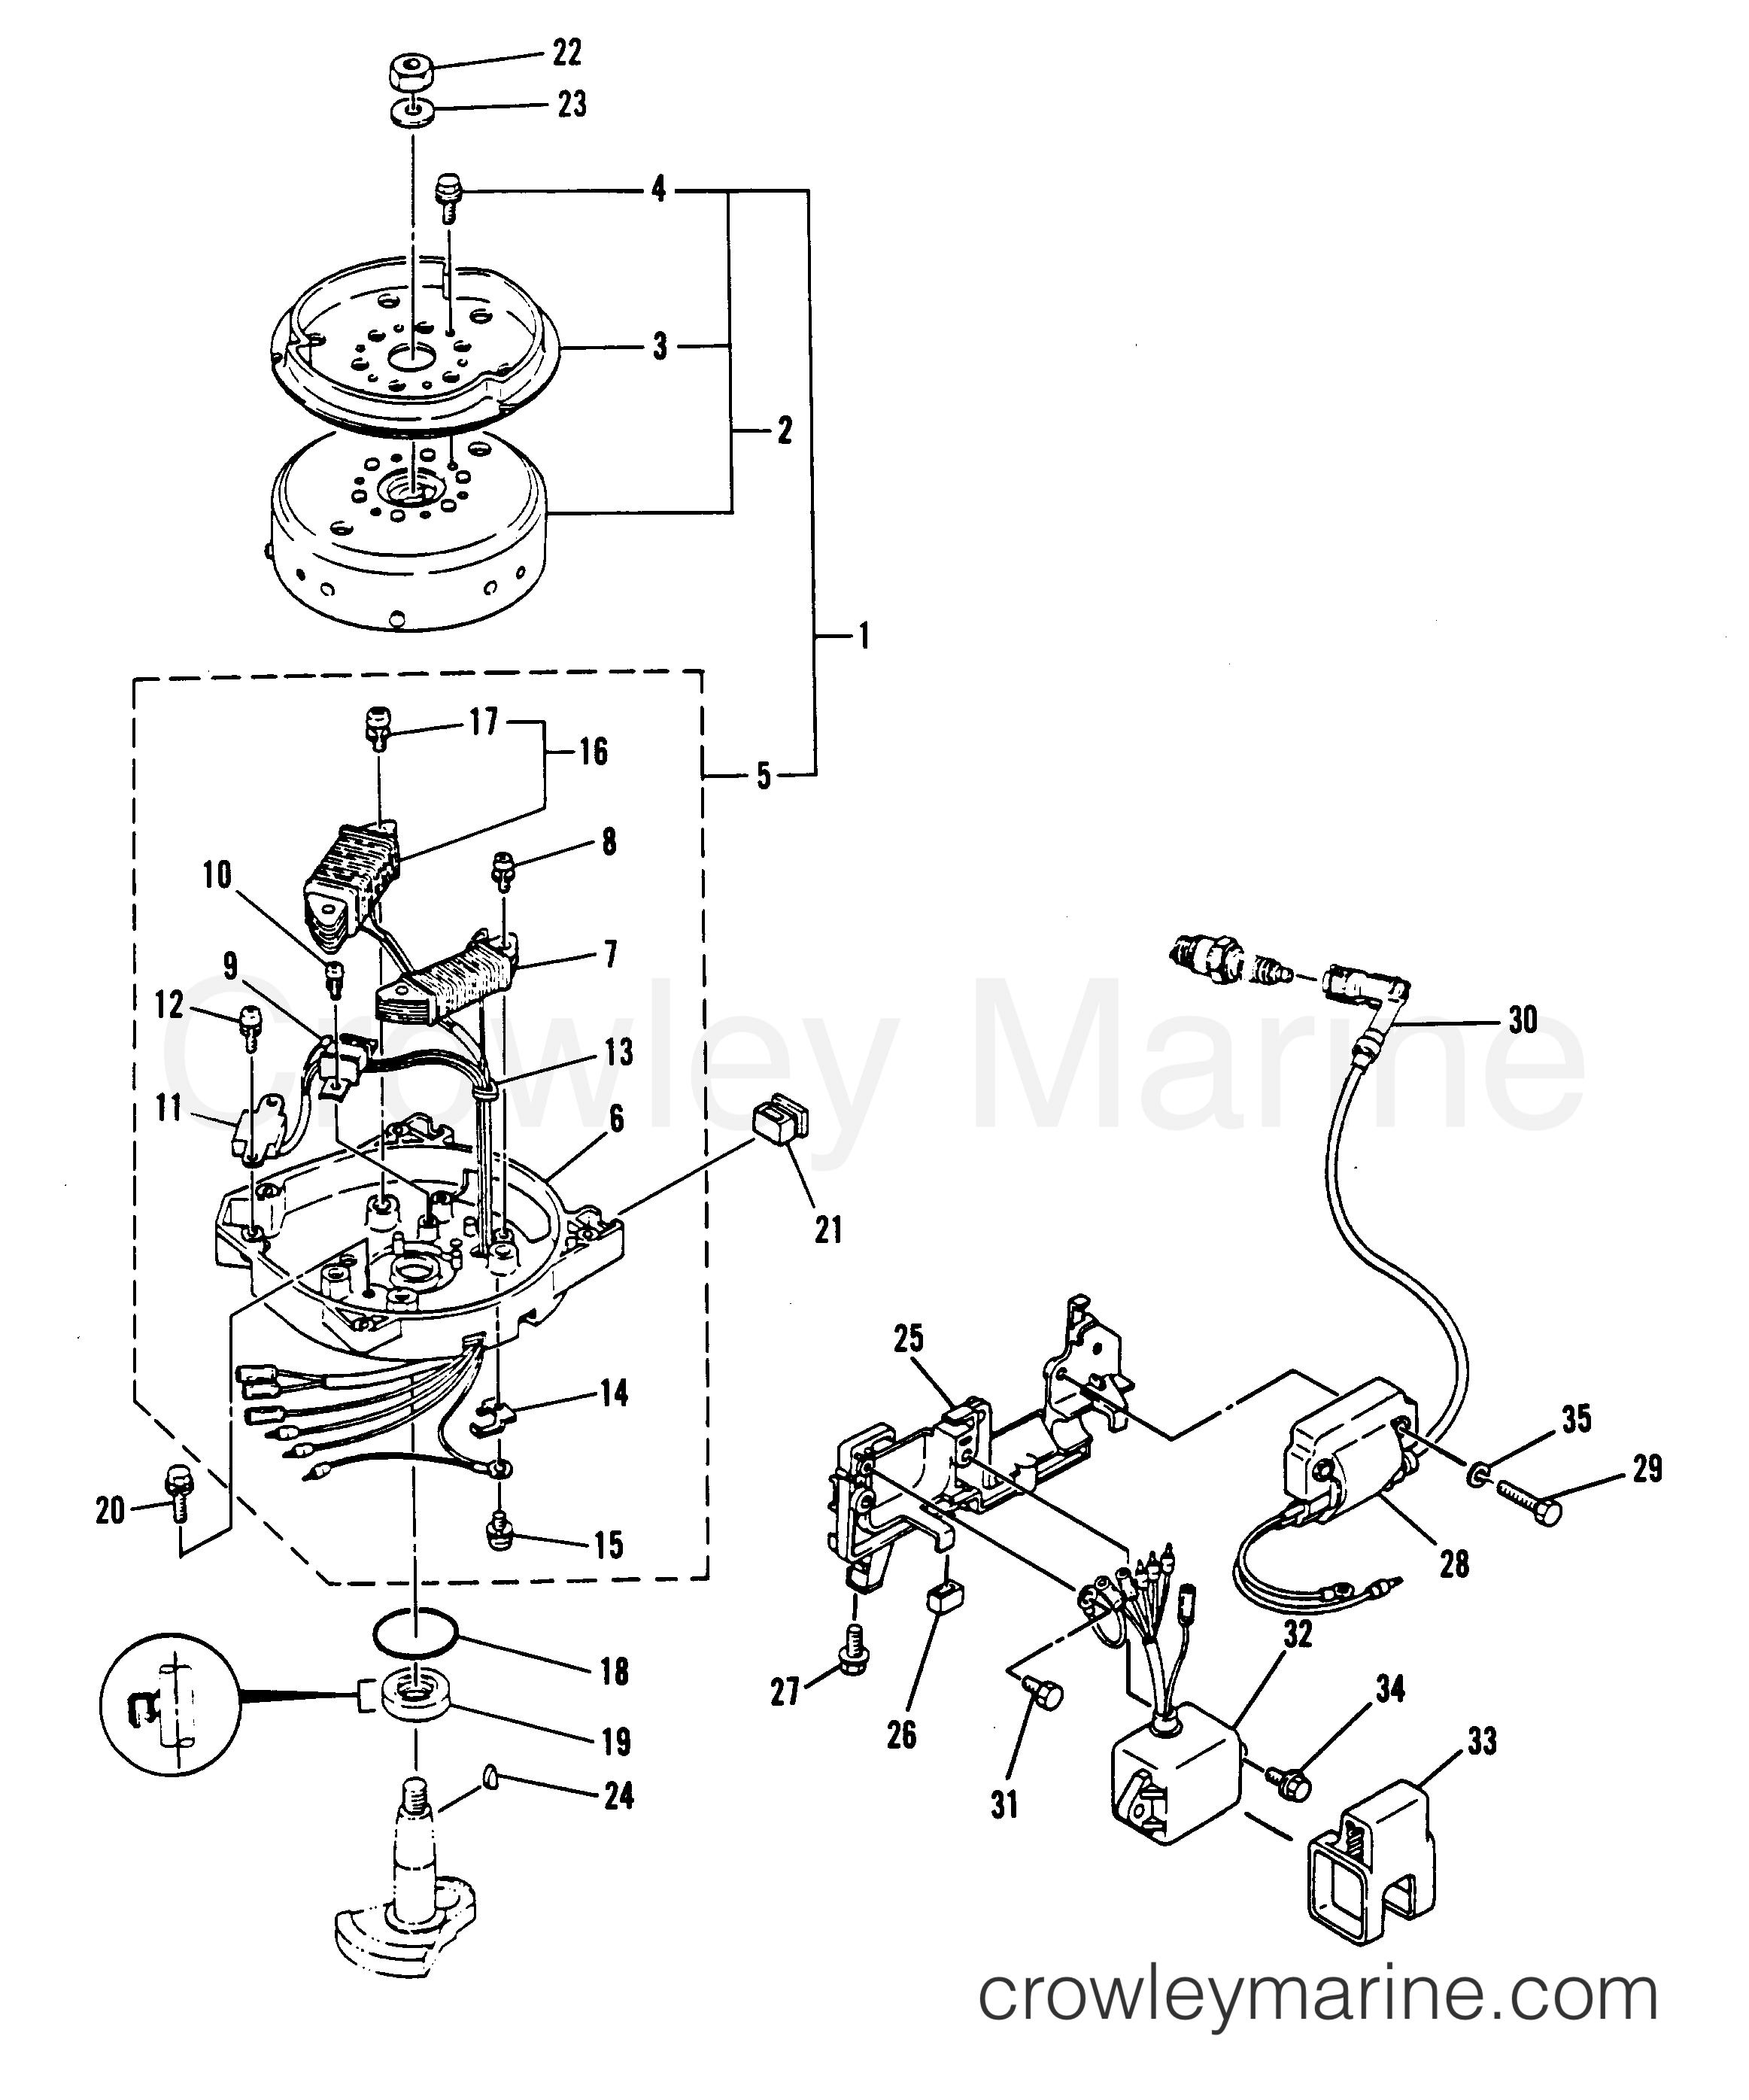 cdi ratchet diagram wiring diagram all data Chinese ATV Wiring Harness Diagram cdn crowleymarine mercury t6zejm8v 6 wire cdi box diagram honda cdi ratchet diagram